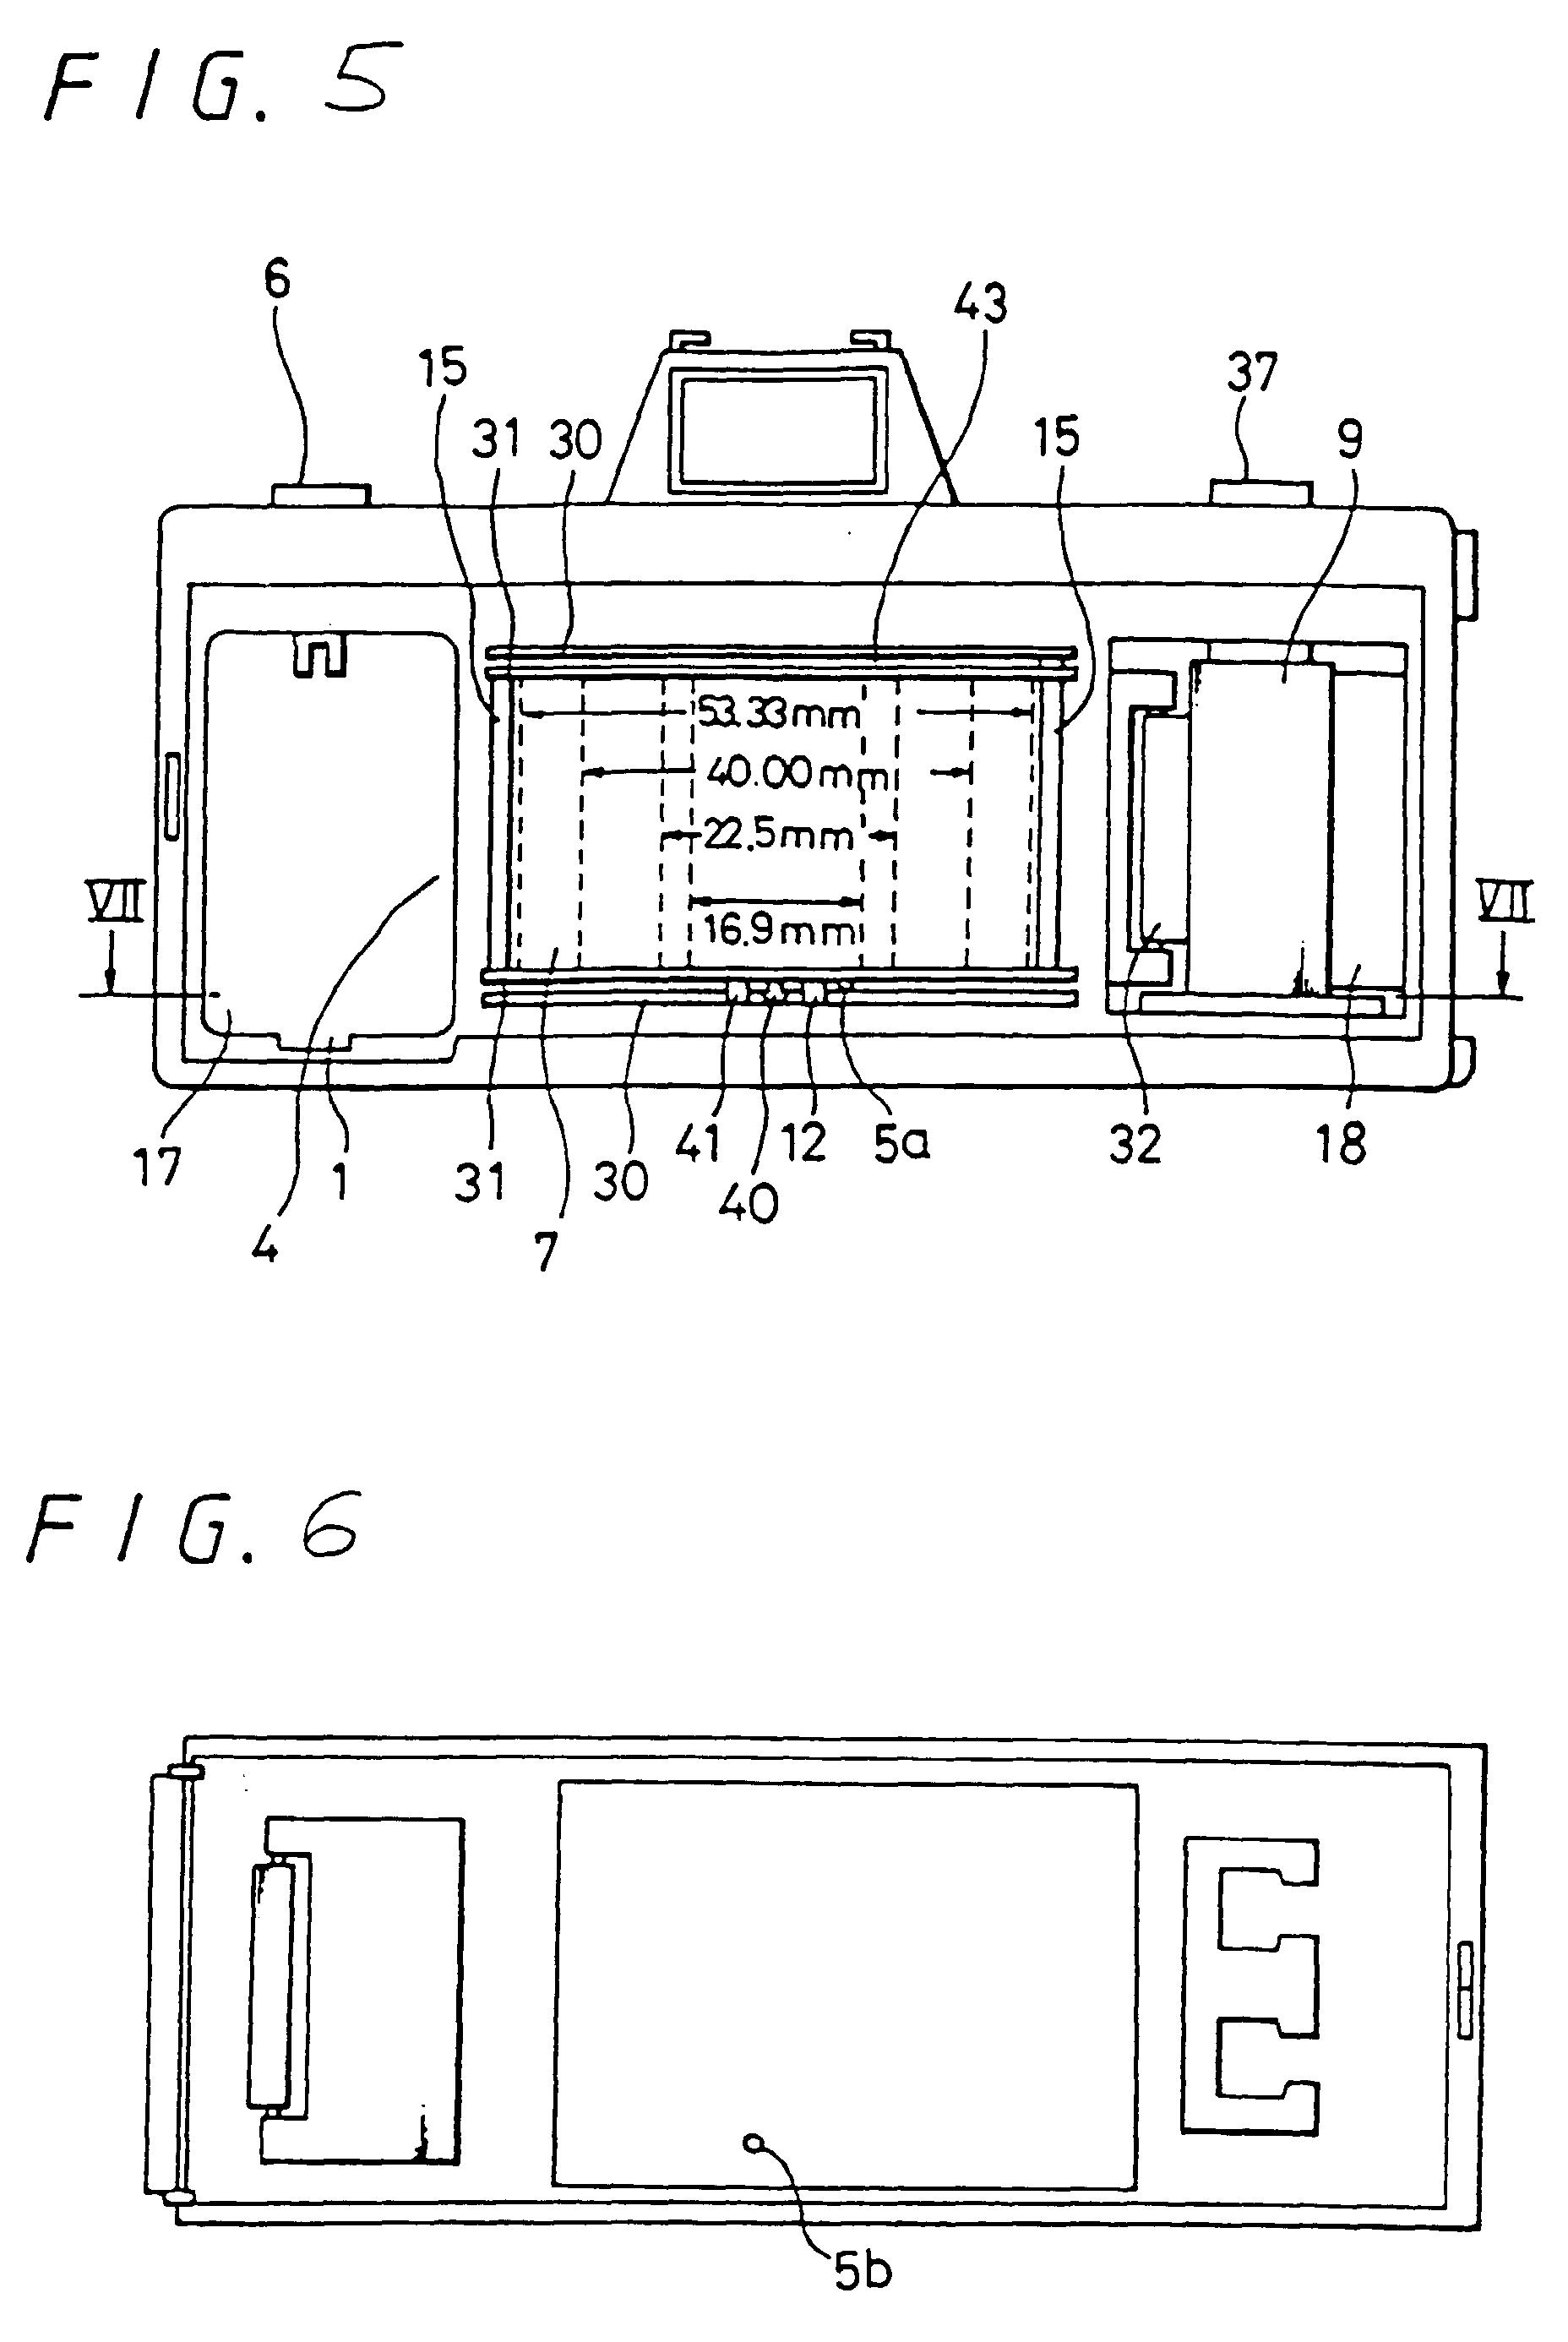 专利ep1076260a2 - apparatus